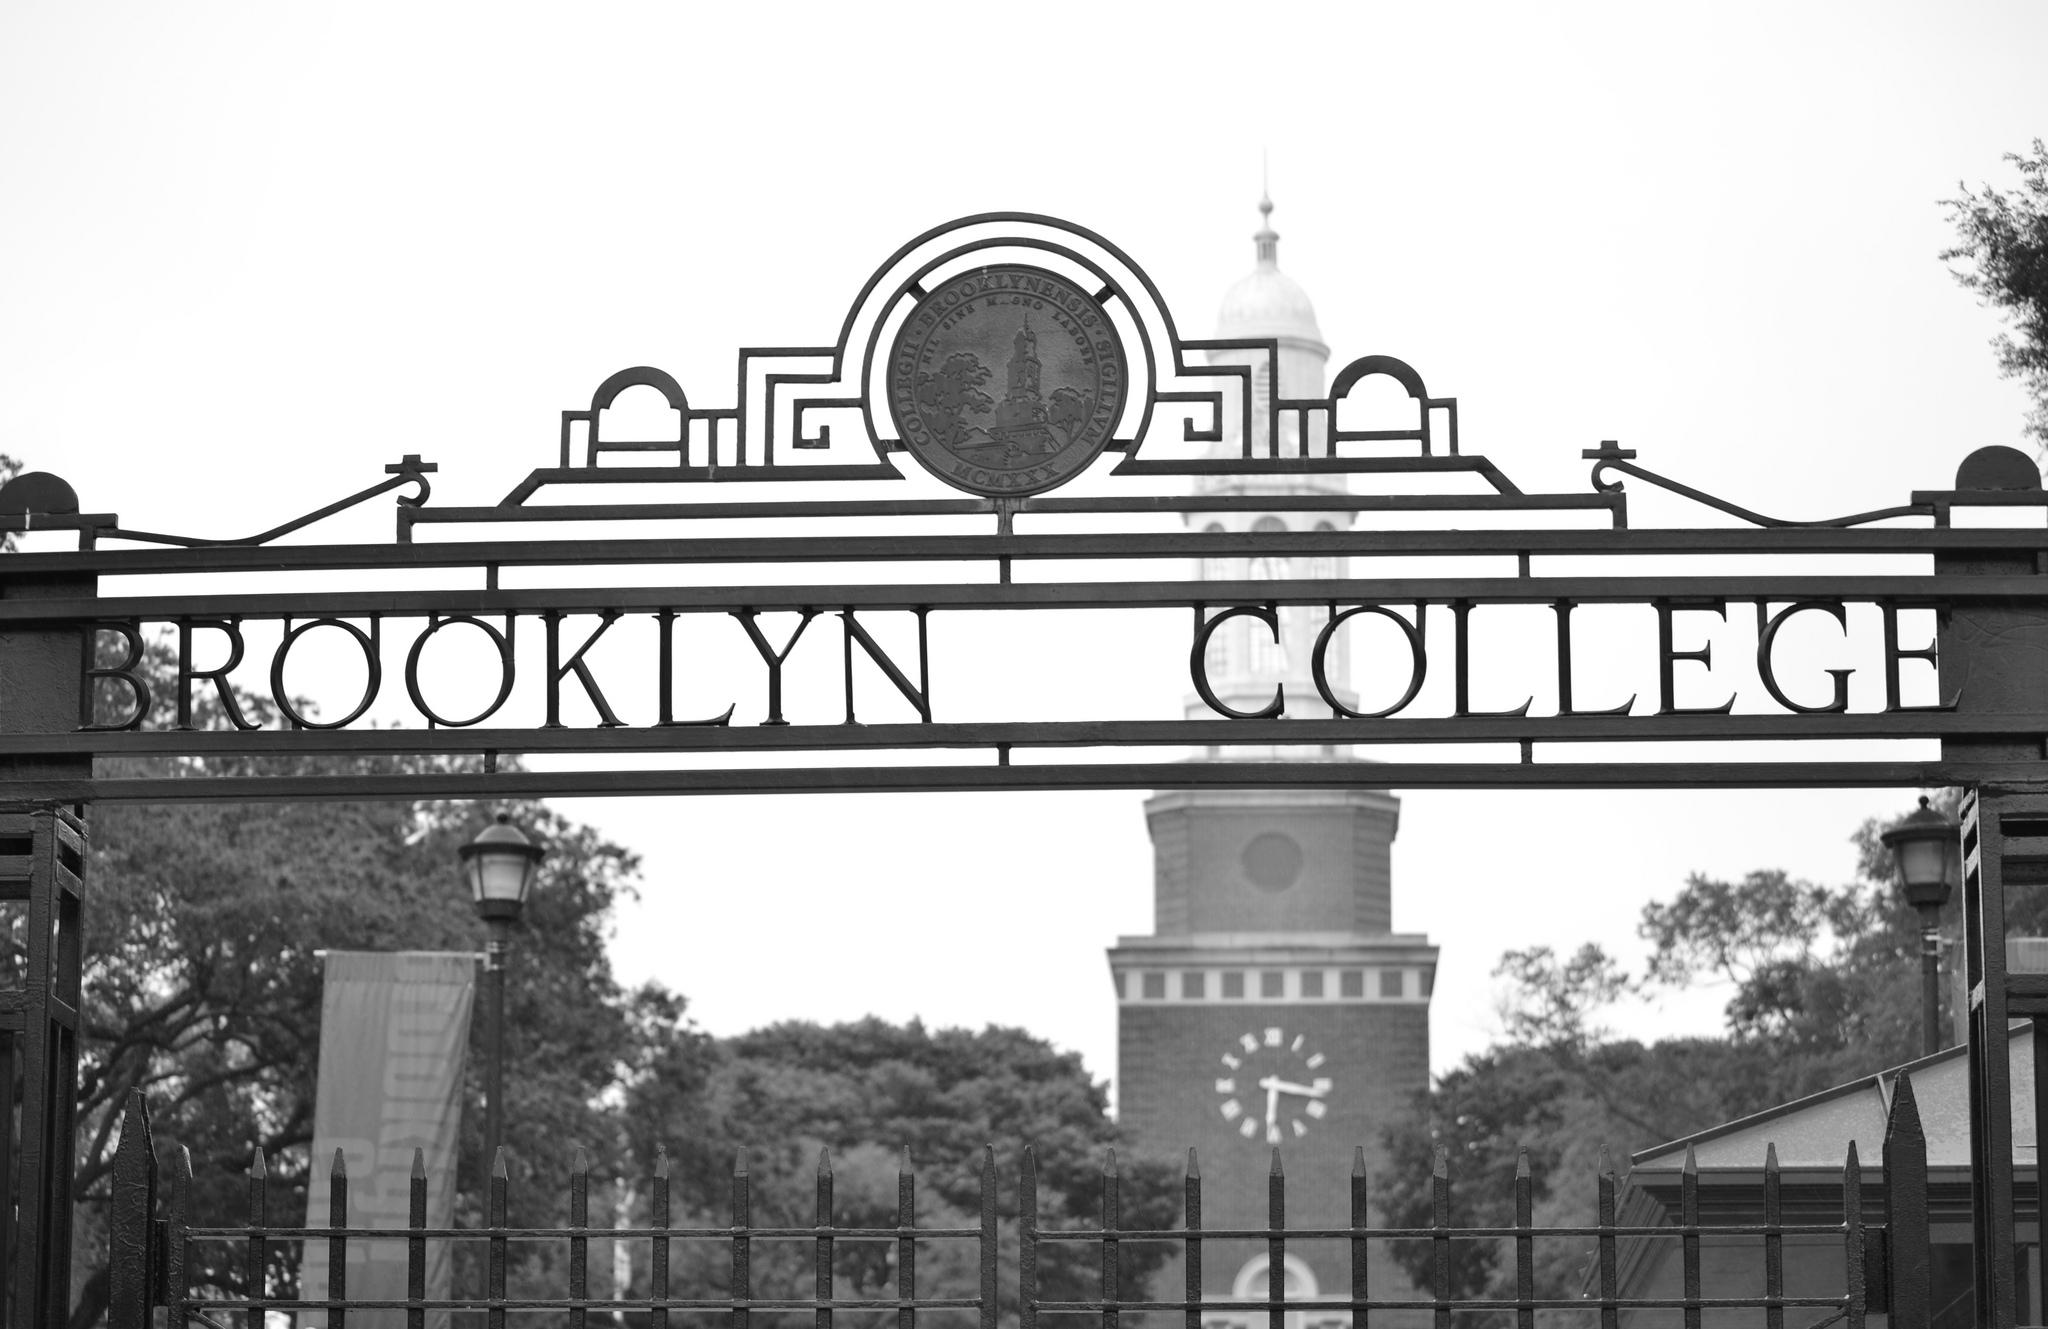 BrooklynCollegeArch.jpg